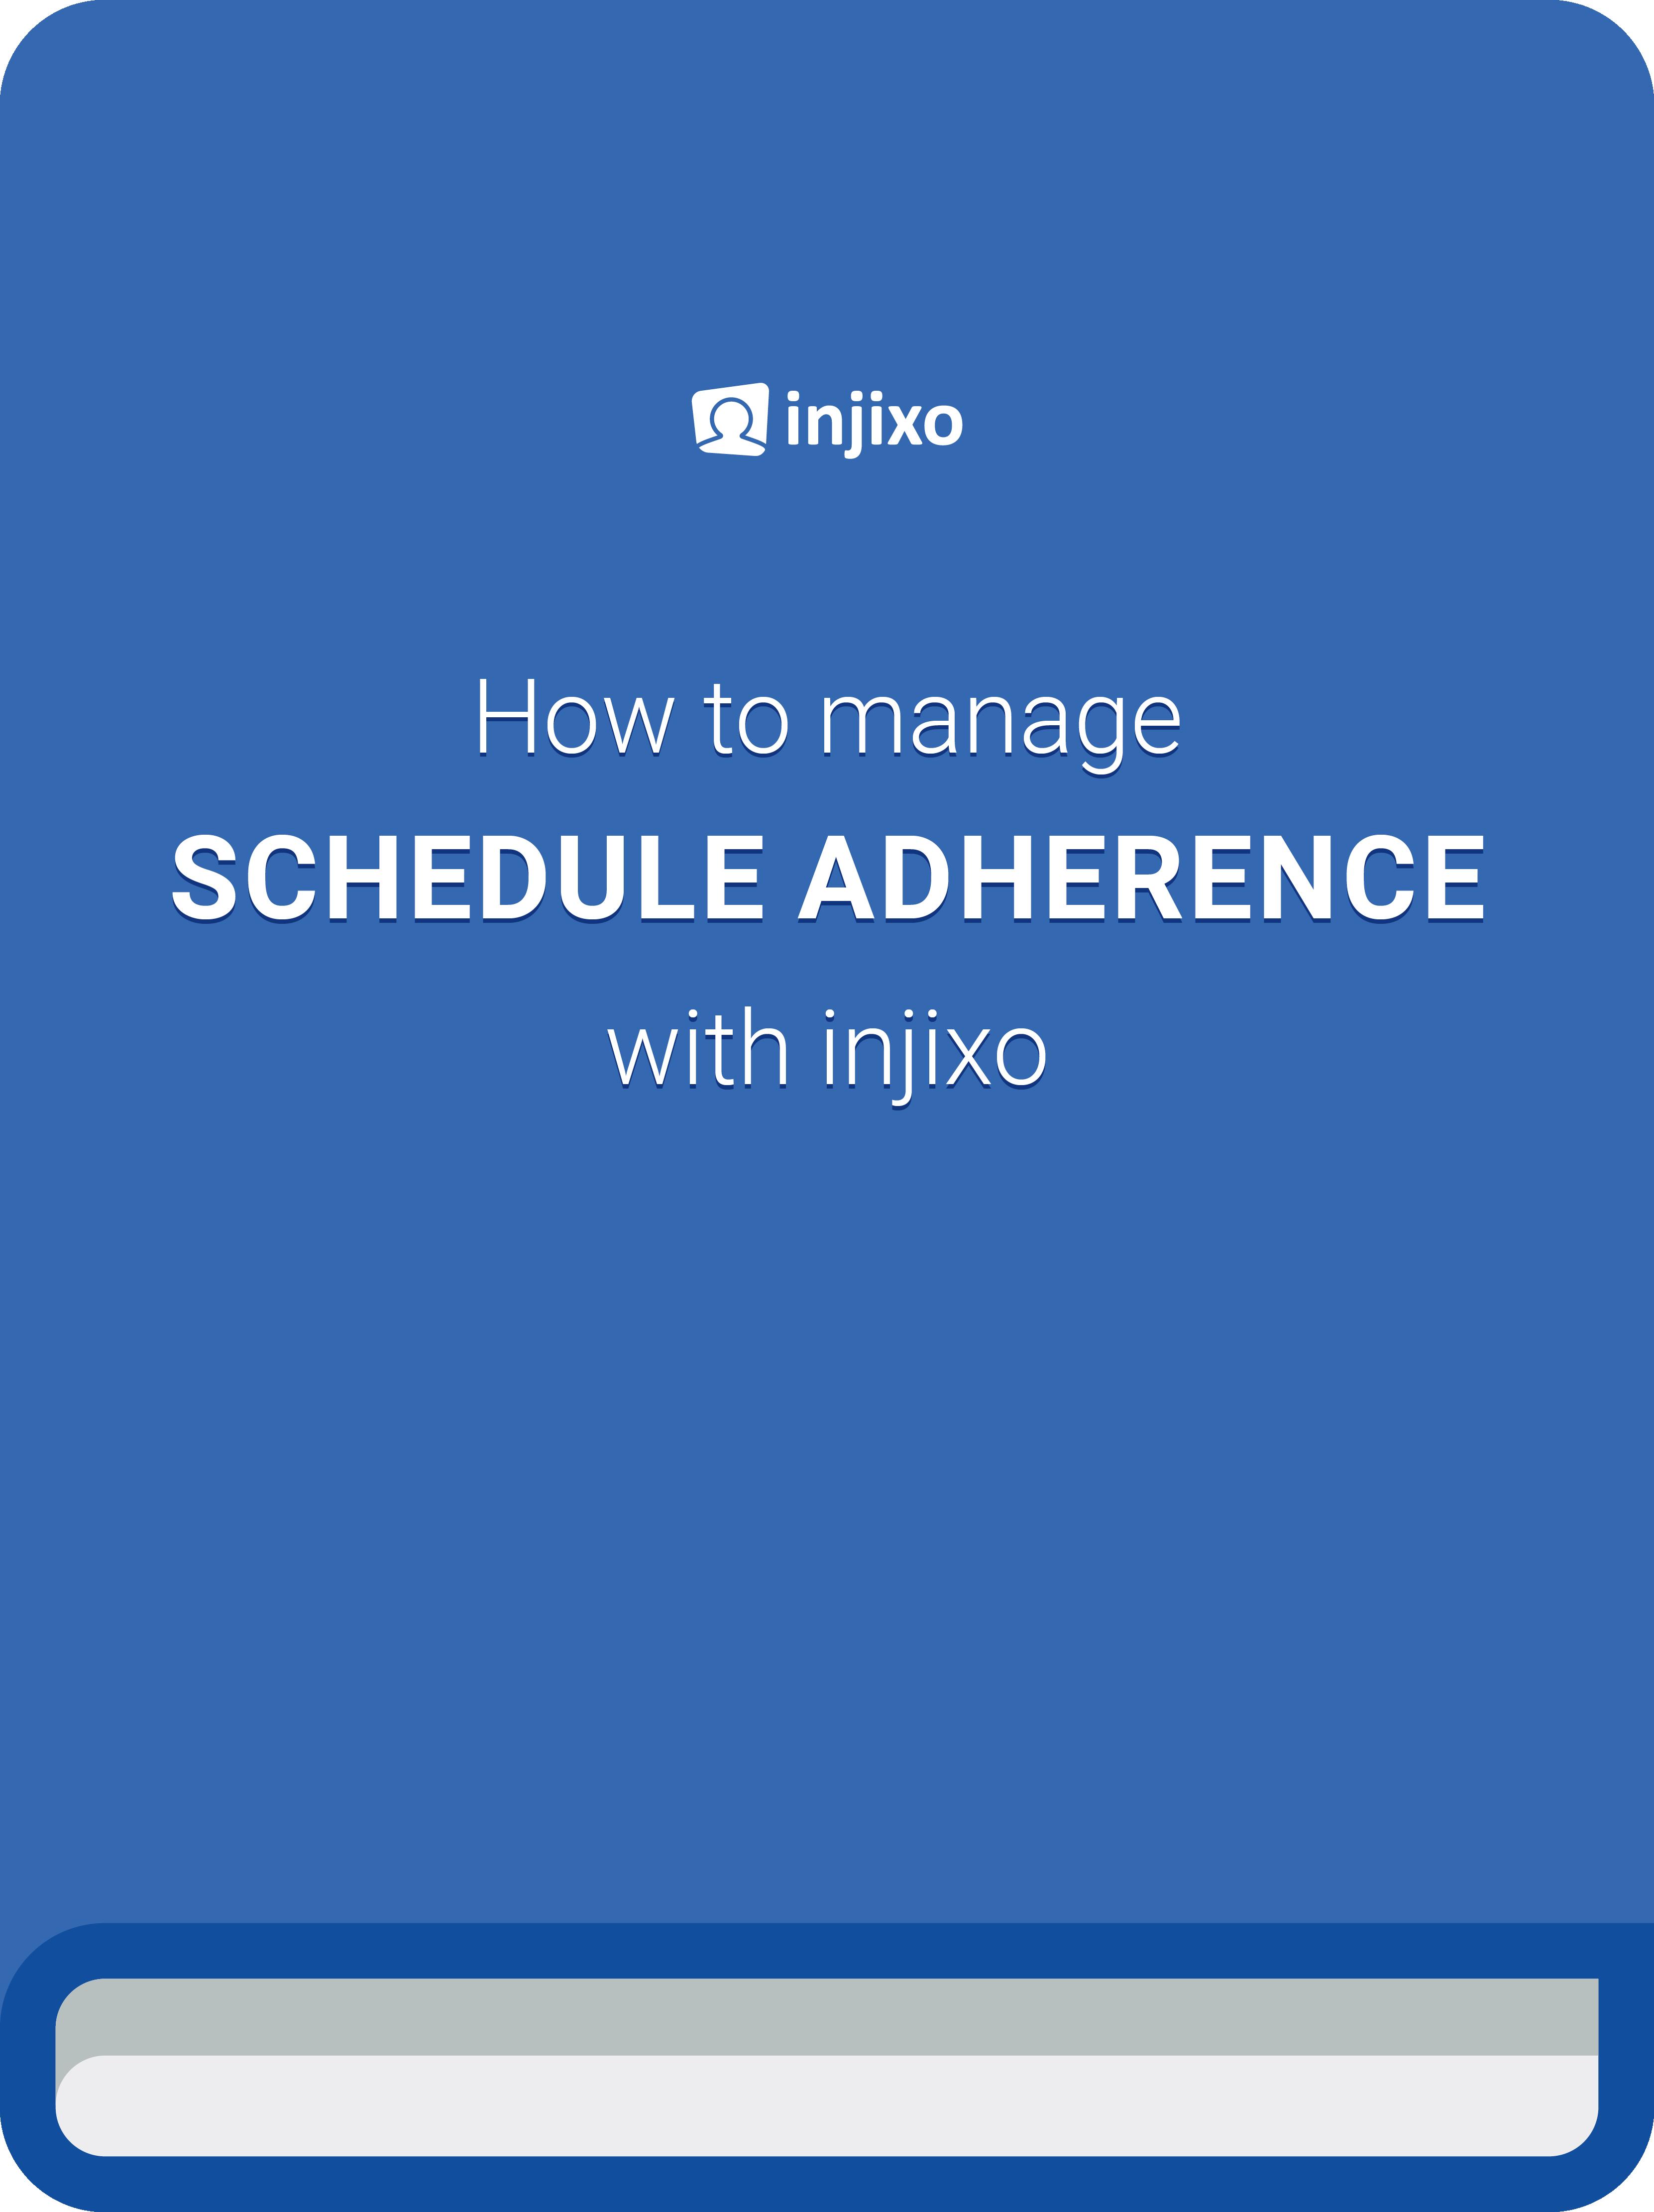 injixo - EN - ebook schedule adherence with injixo cover.png